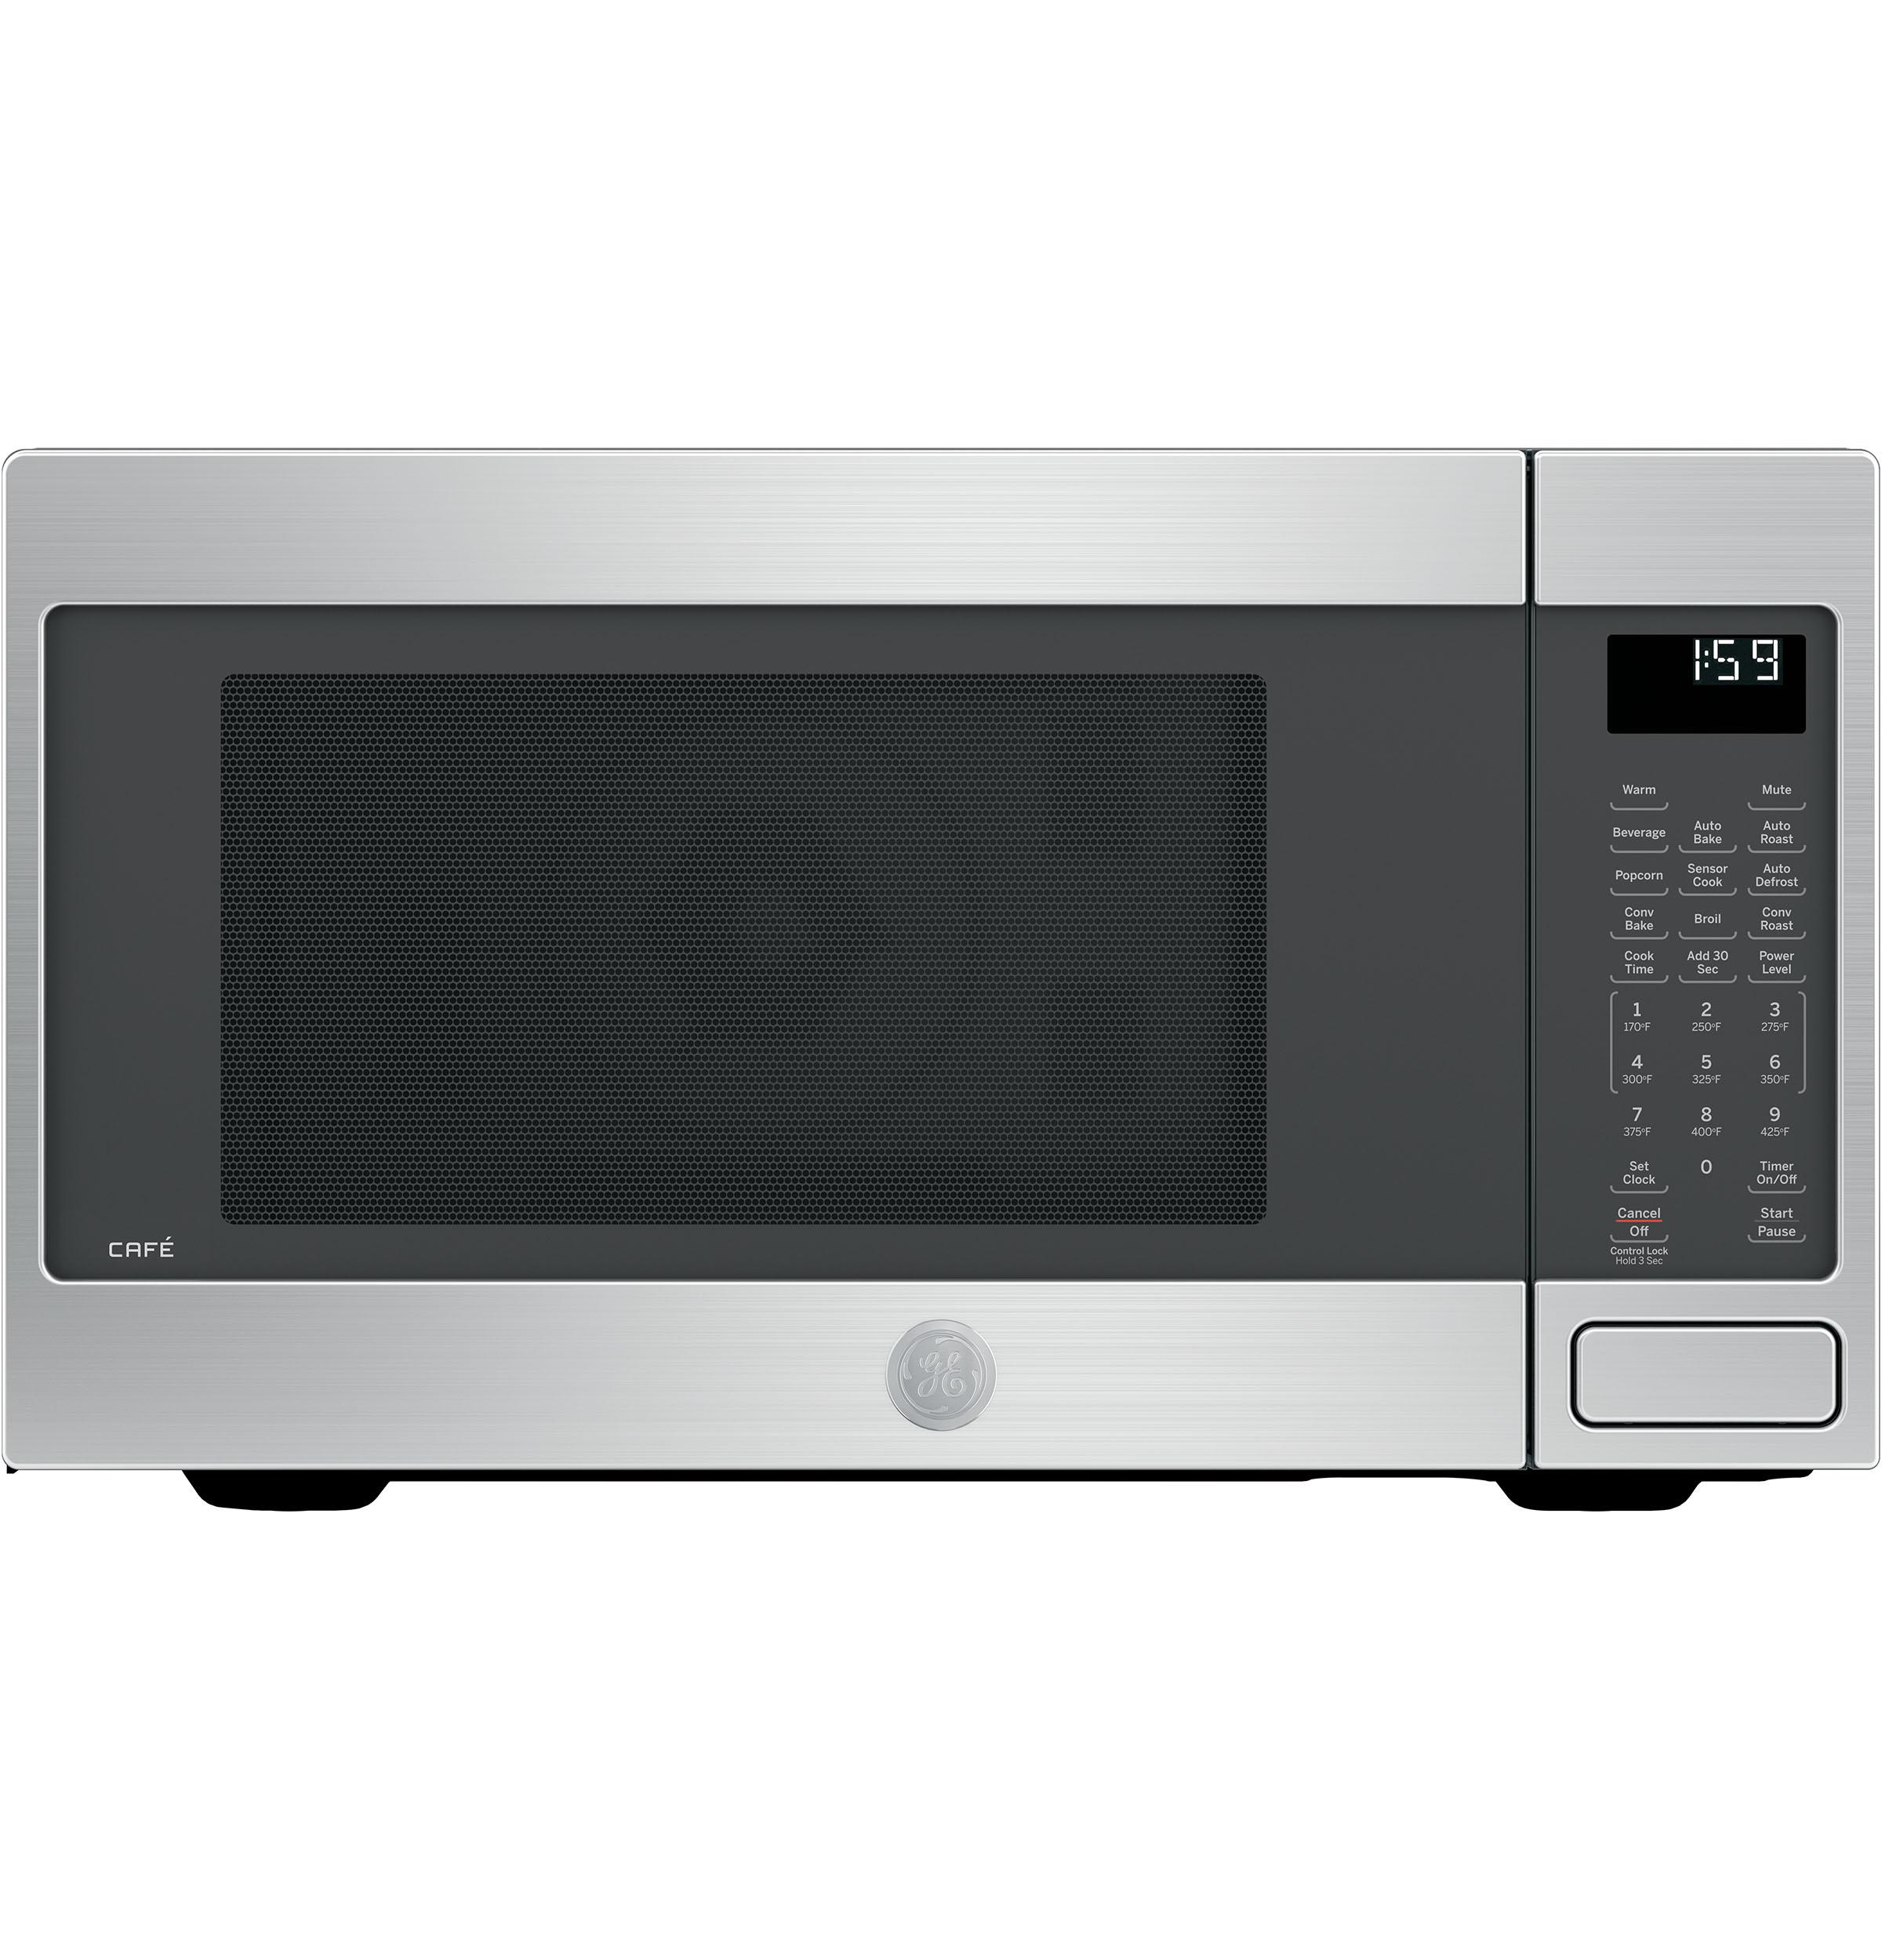 GE Café™ Series 1.5 Cu. Ft. Countertop Convection/Microwave Oven